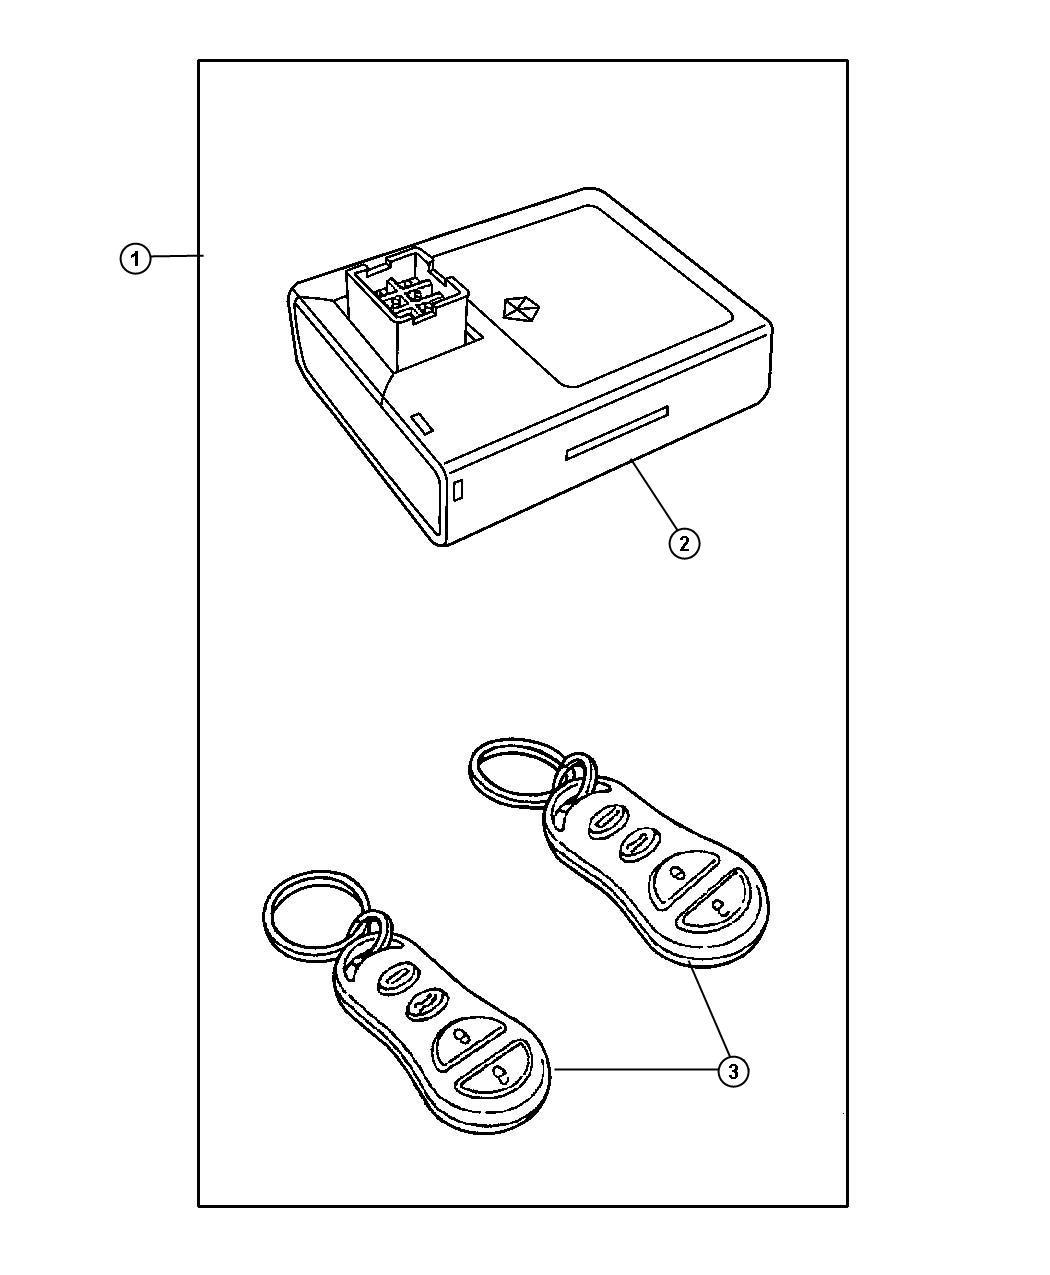 Chrysler Sebring Receiver Keyless Entry Gxr After 7 13 01 Lock Rear Components